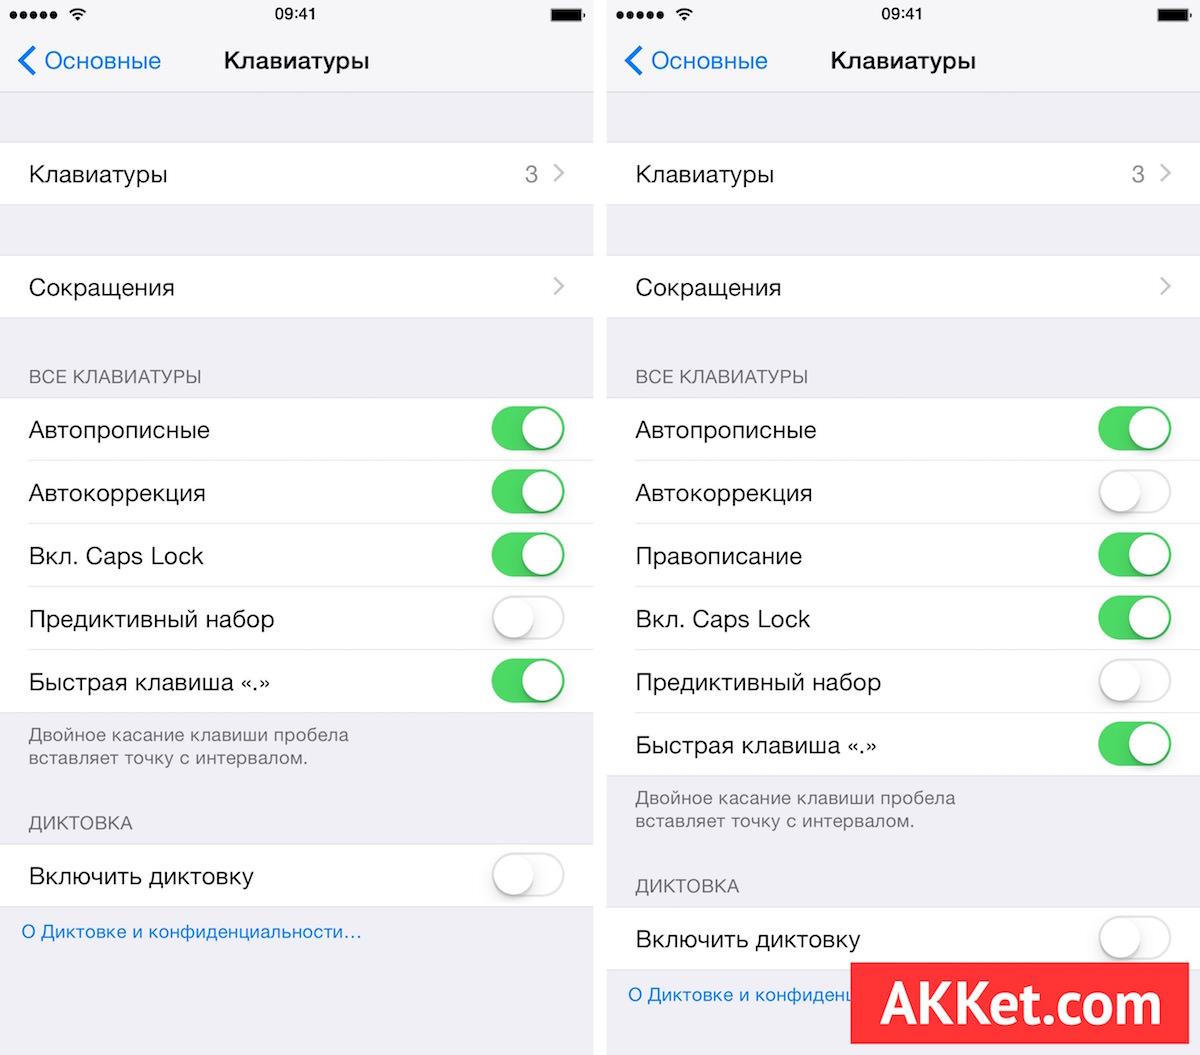 OS X iOS orfo iPhone iPad russia russian 2